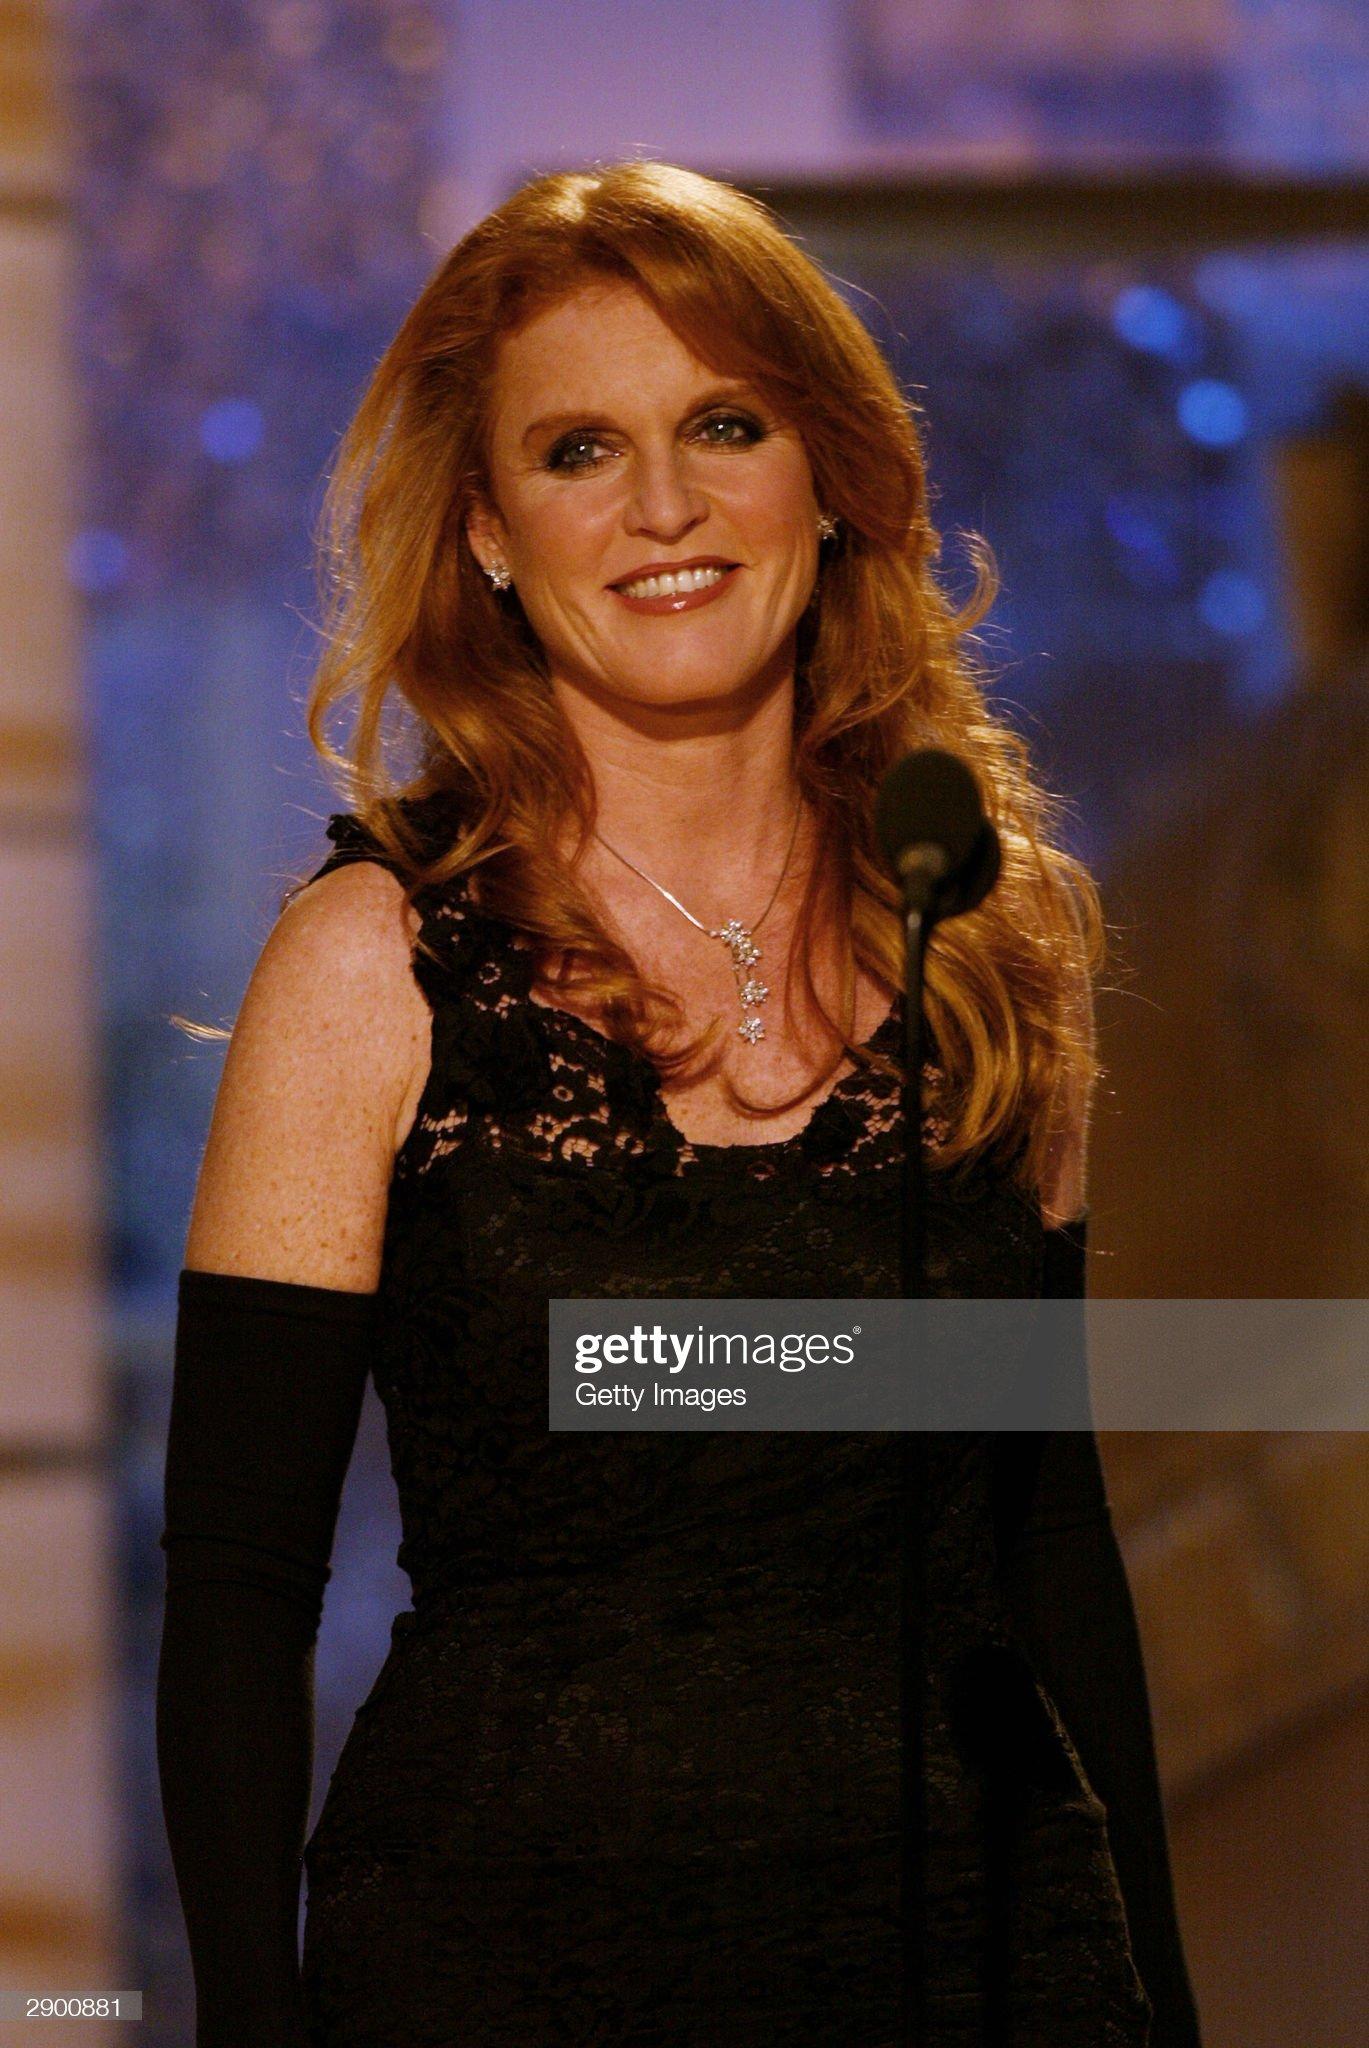 61st Annual Golden Globe Awards - Show : News Photo